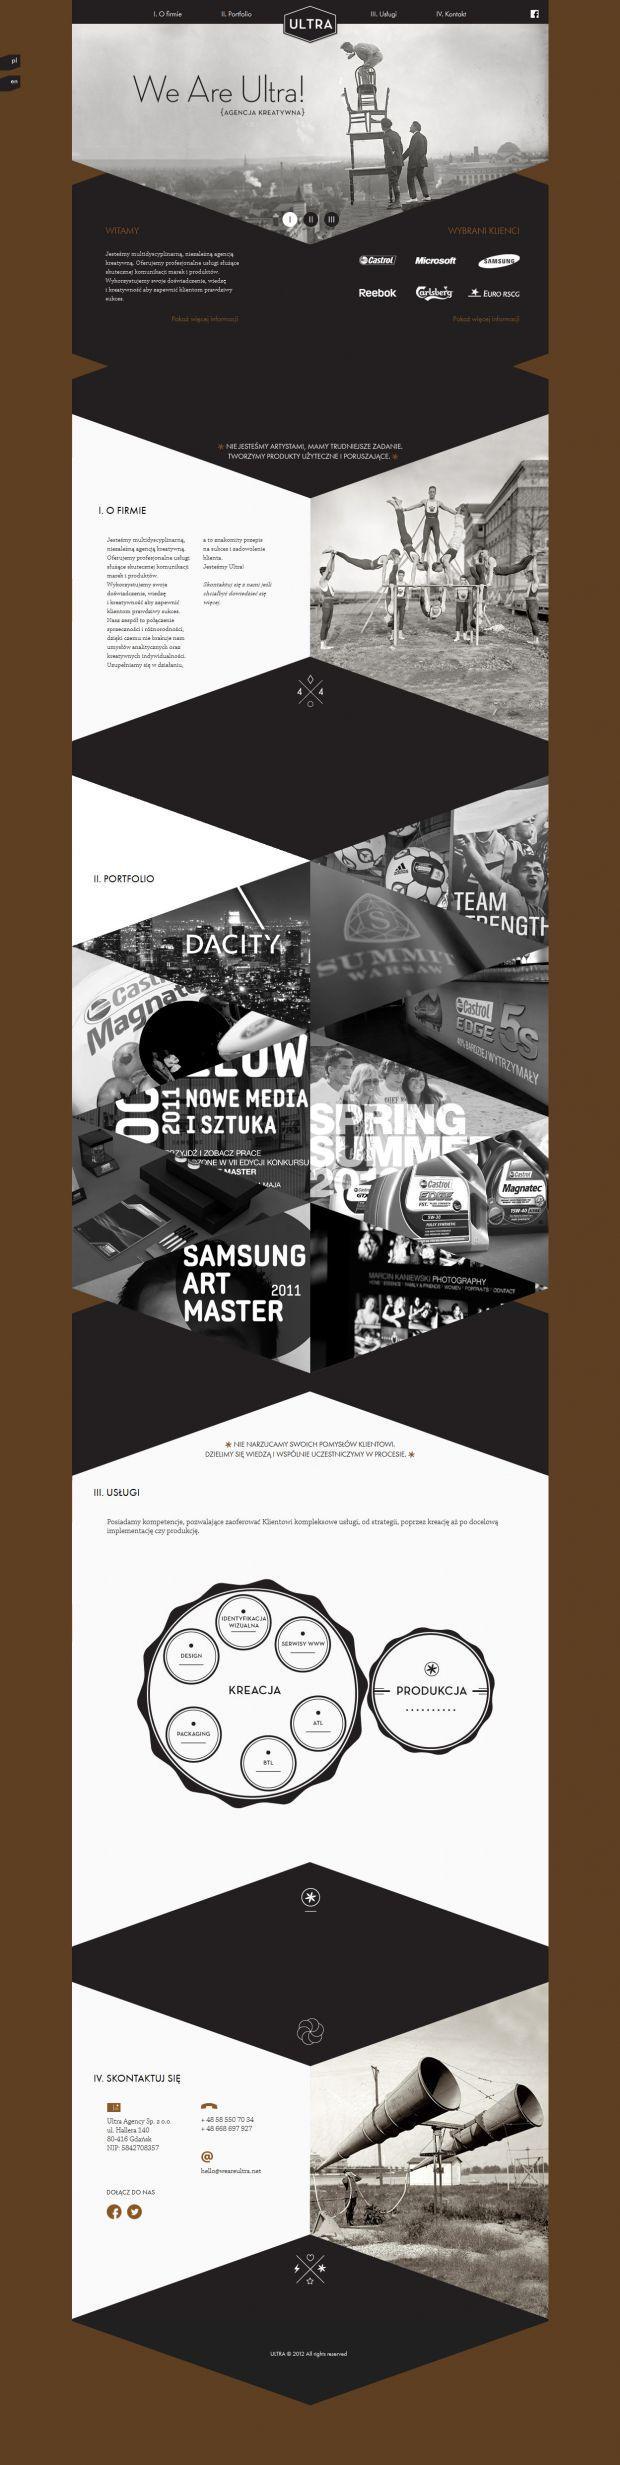 Ultra - We Are Ultra - Creative Agency - Webdesign inspiration www.niceoneilike.com